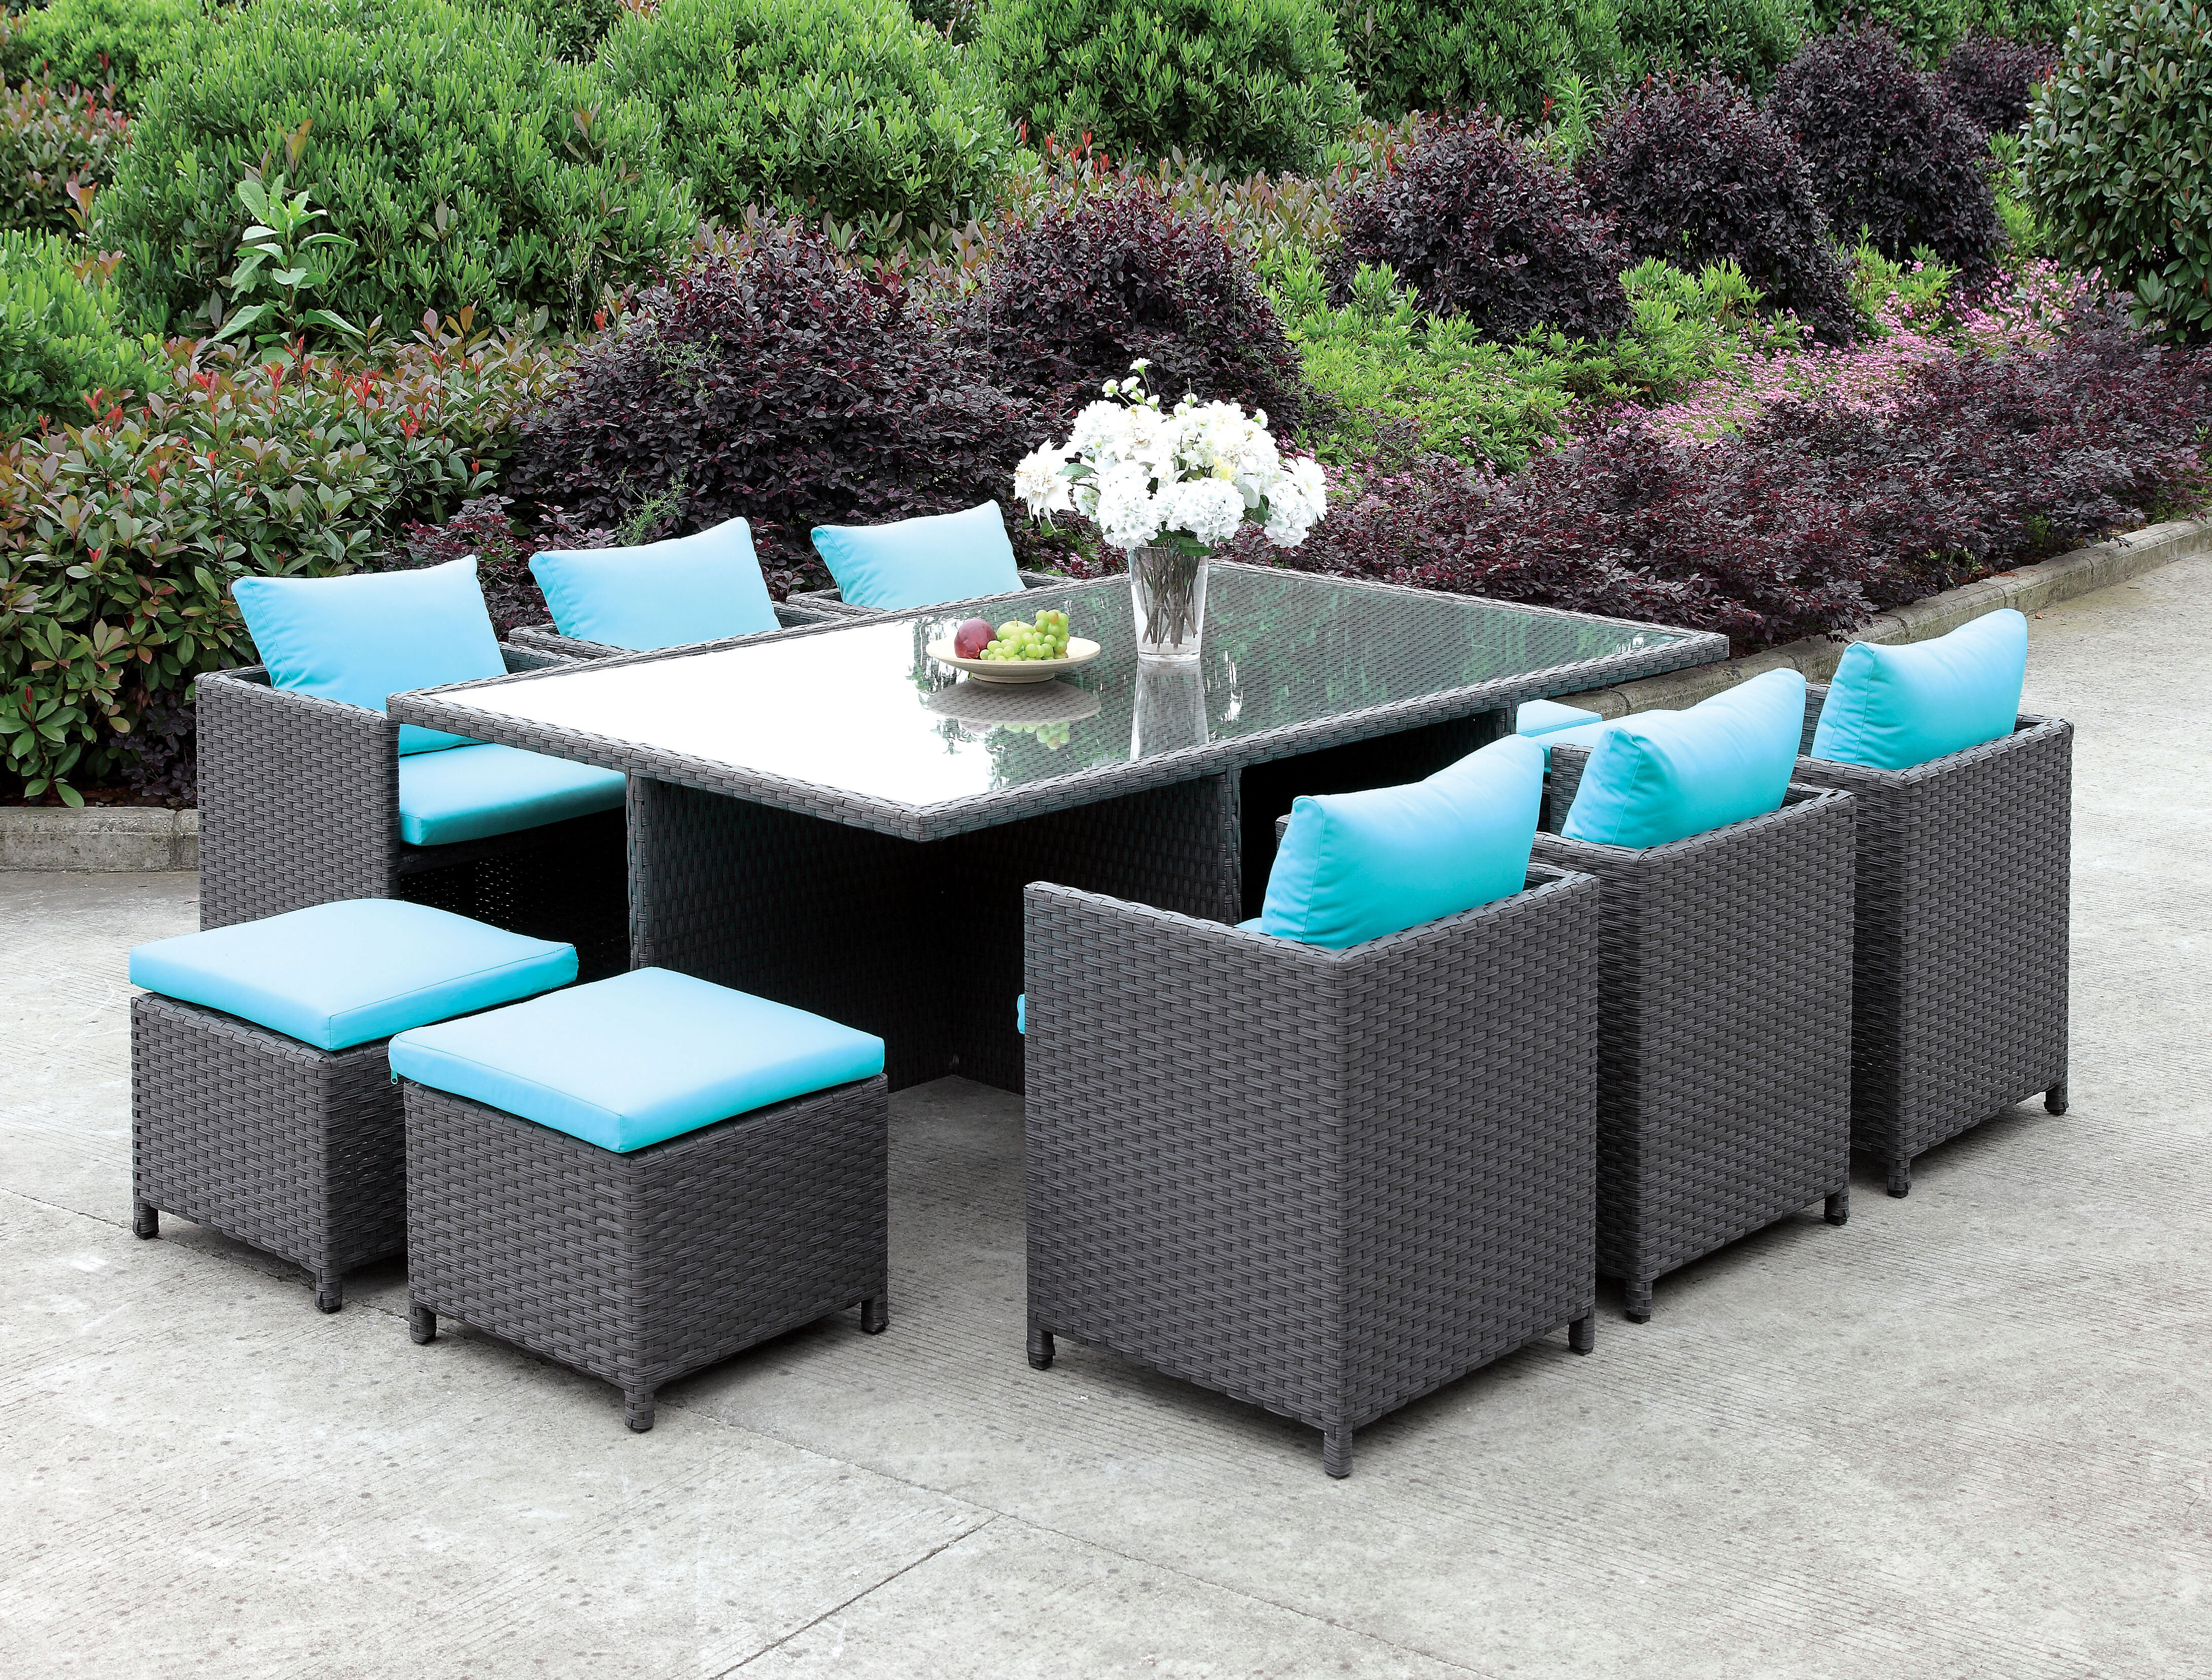 Gentil Brayden Studio Tamayo 11 Piece Dining Set With Cushions | Wayfair